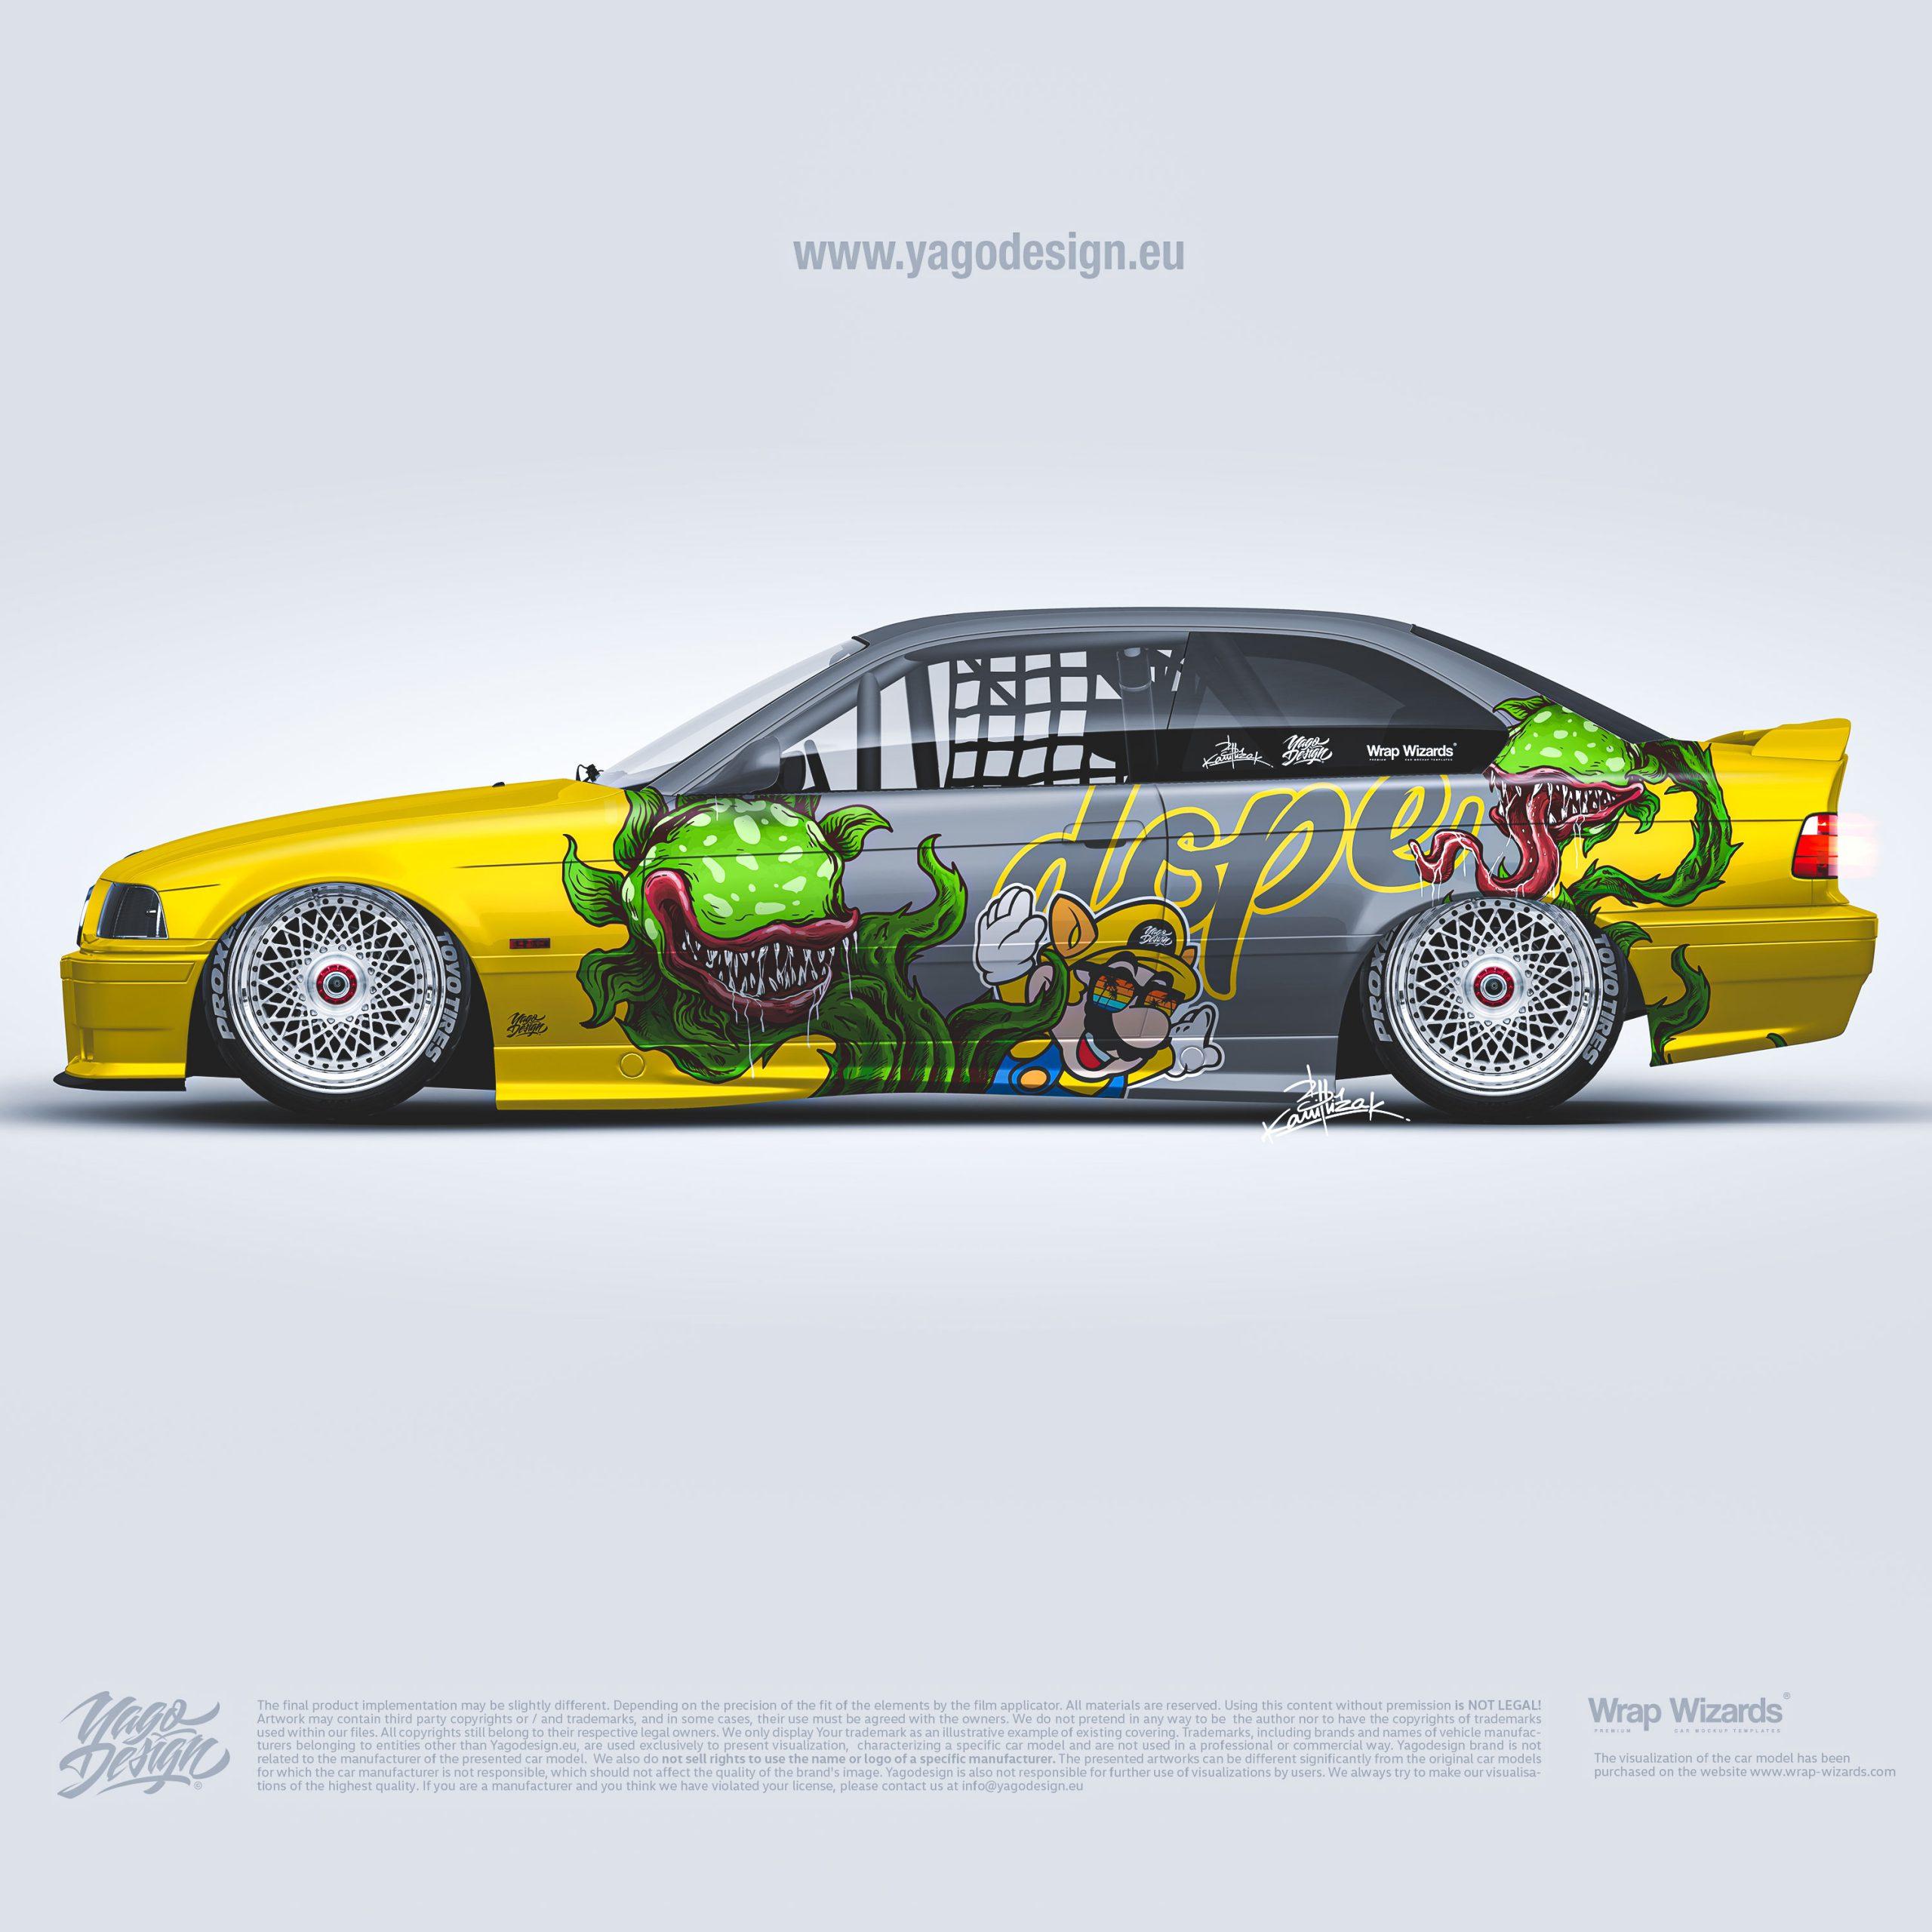 BMW-E36-BY-YAGODESIGN-Automotive-Design-Studio